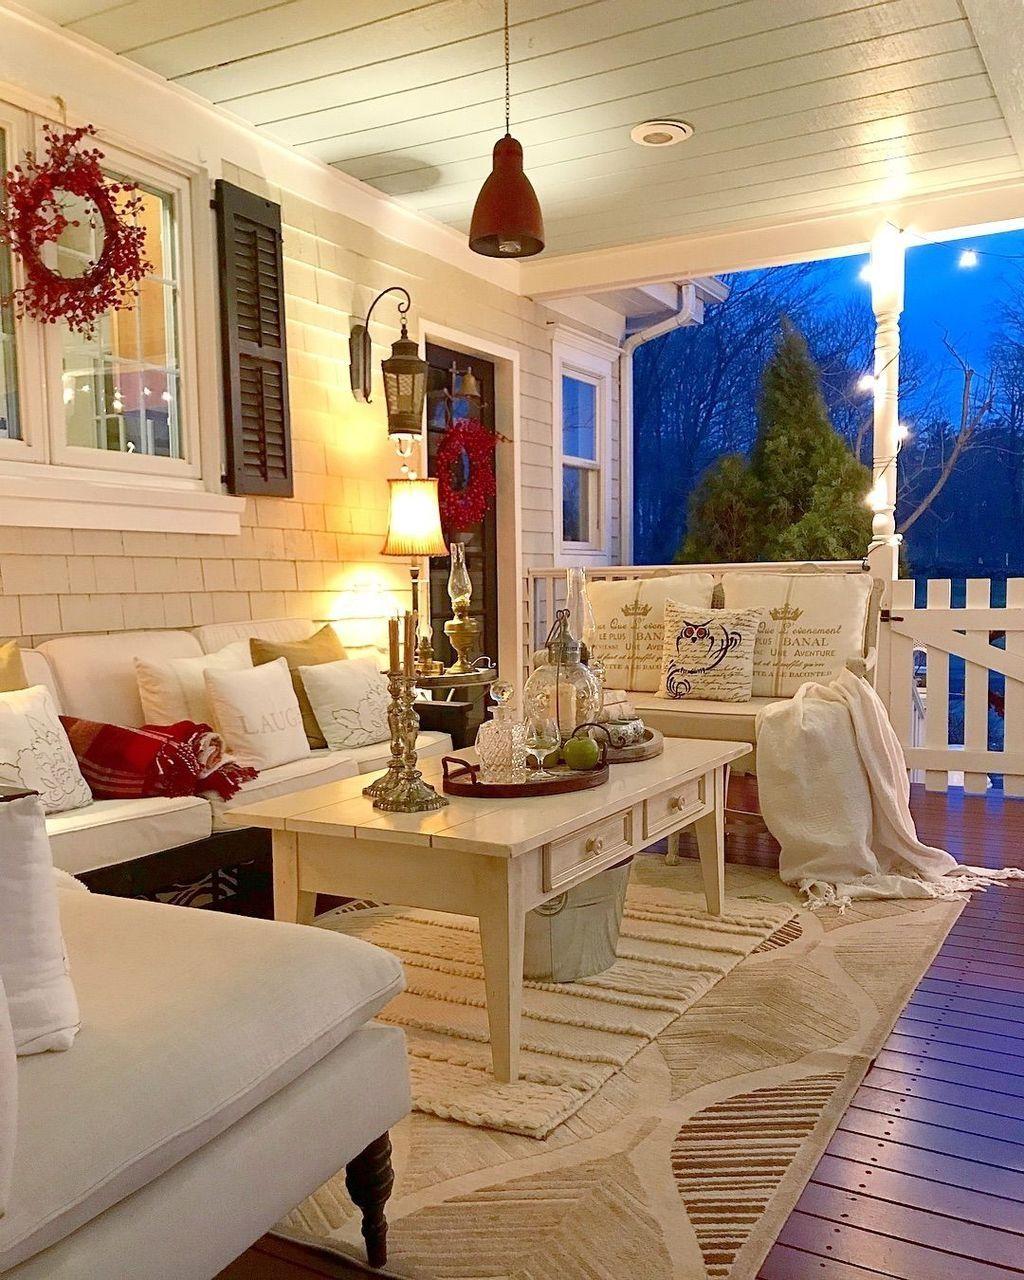 Great Home Design Ideas: 30+ Cozy Front Porch Design And Decor Ideas For You Asap